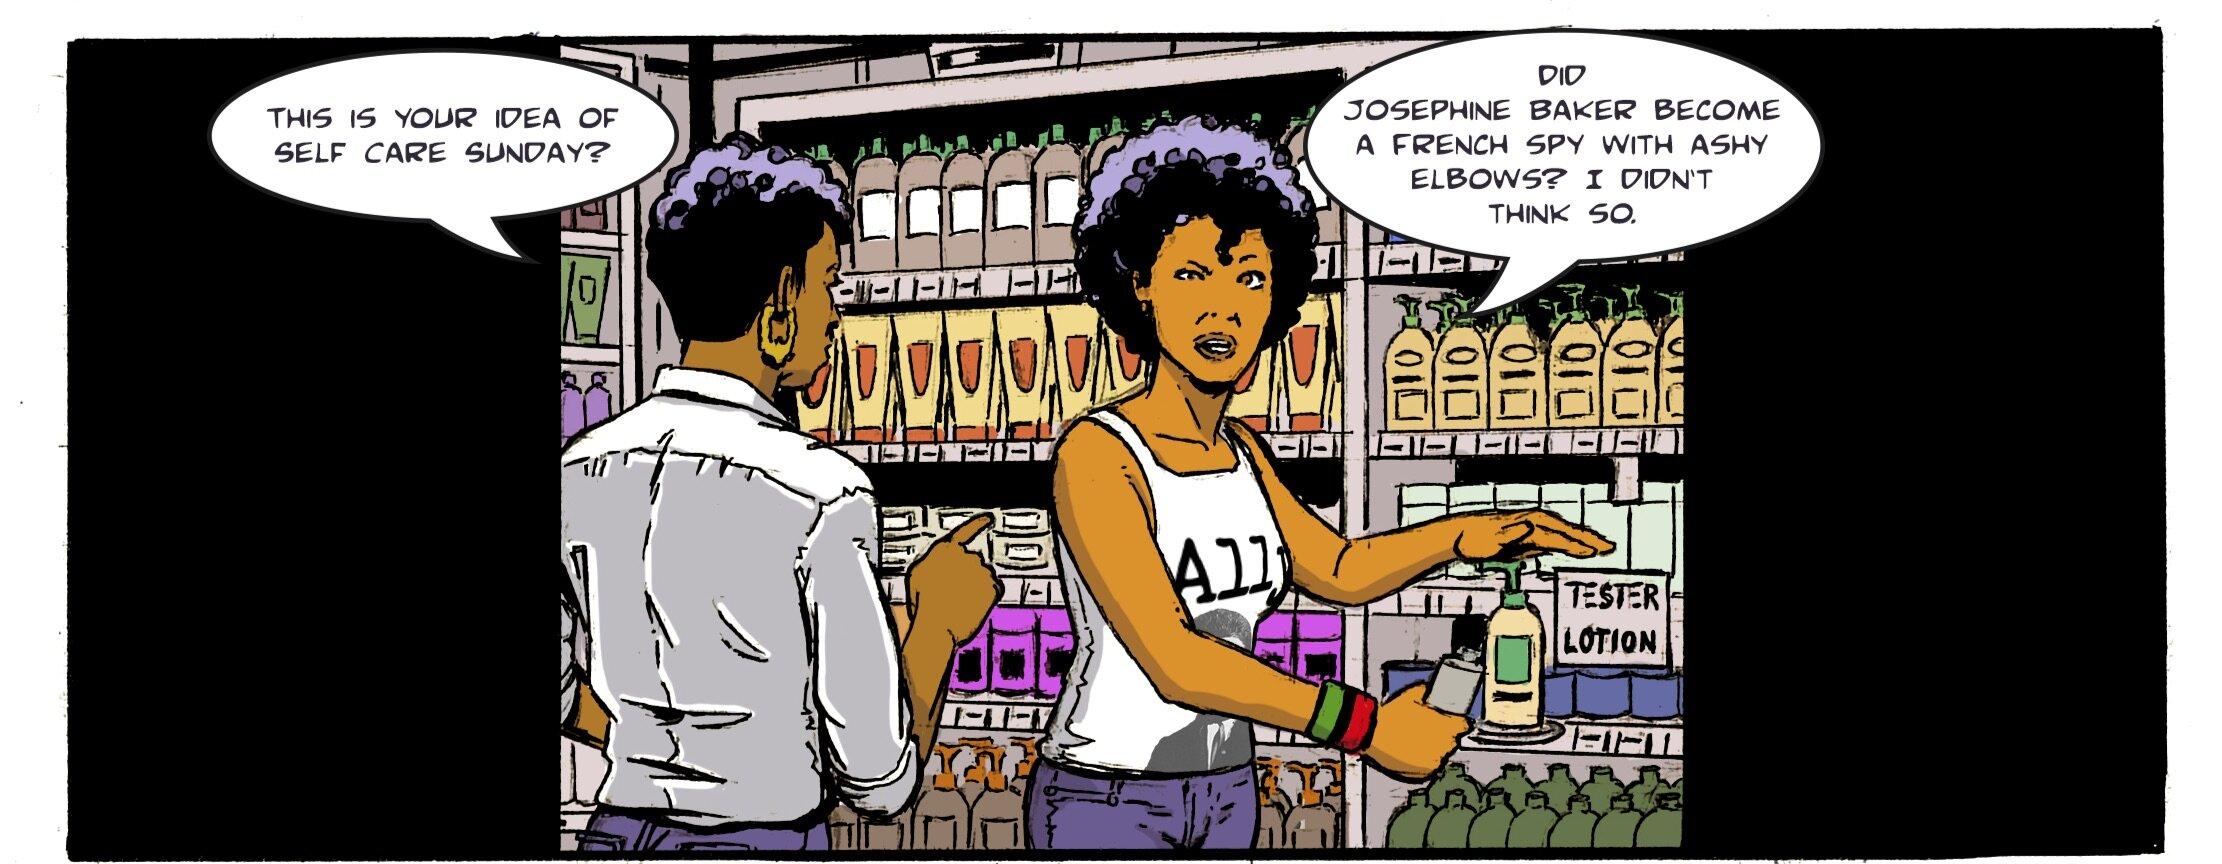 (H)af Comic Strip #95.jpg